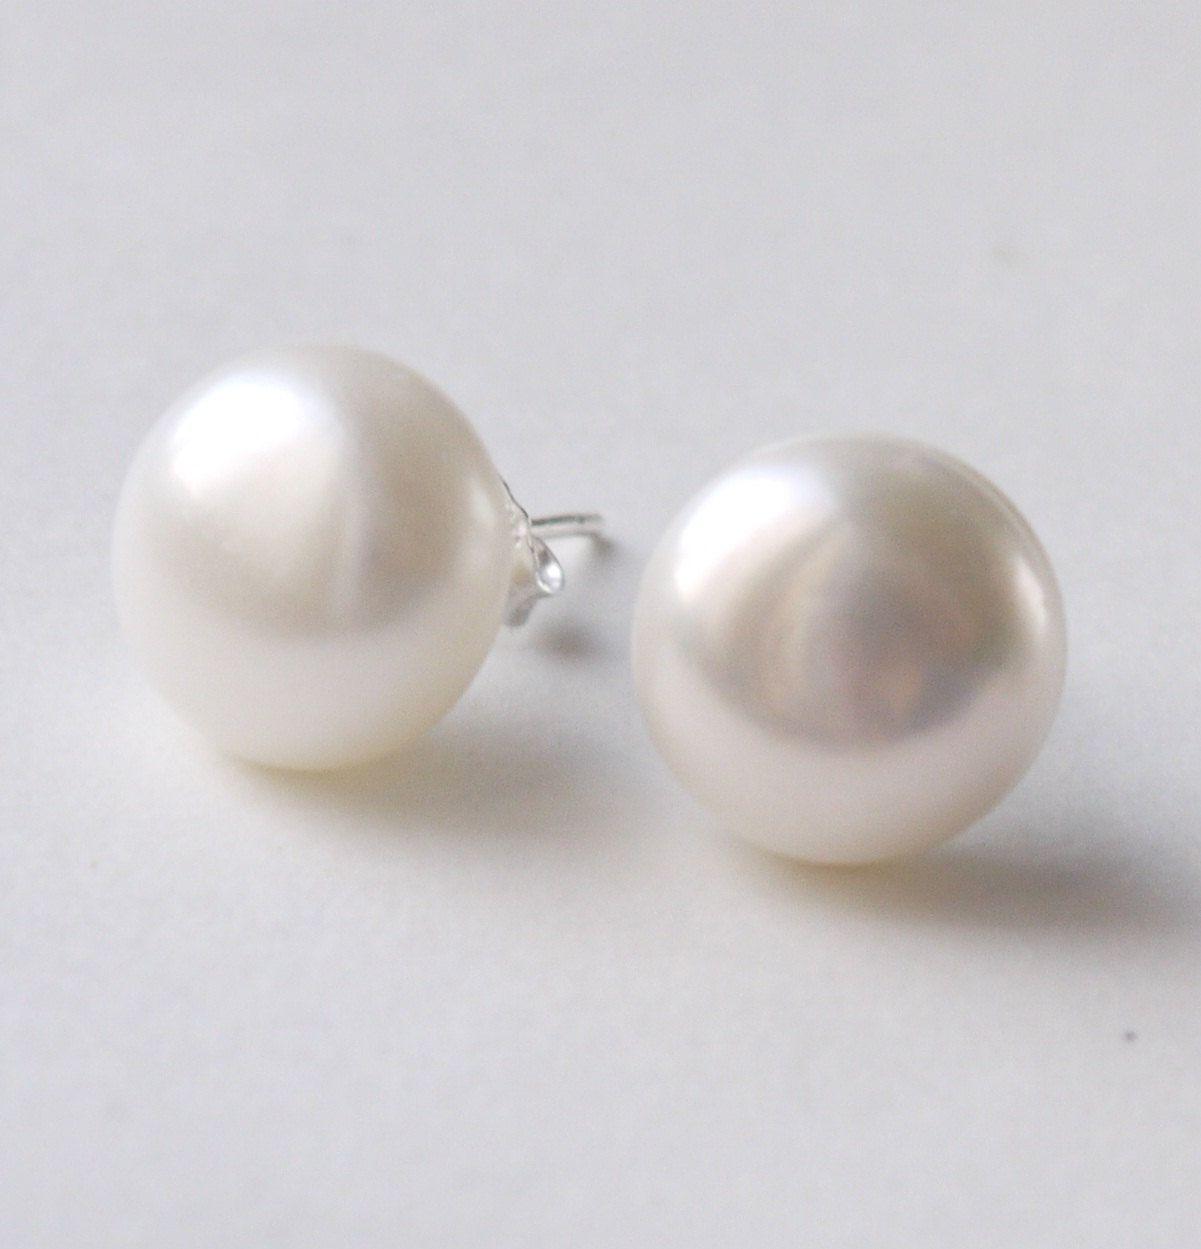 Large Pearl Earrings  14mm Big Ivory White Freshwater Pearl Sterling  Silver Stud Post Earrings